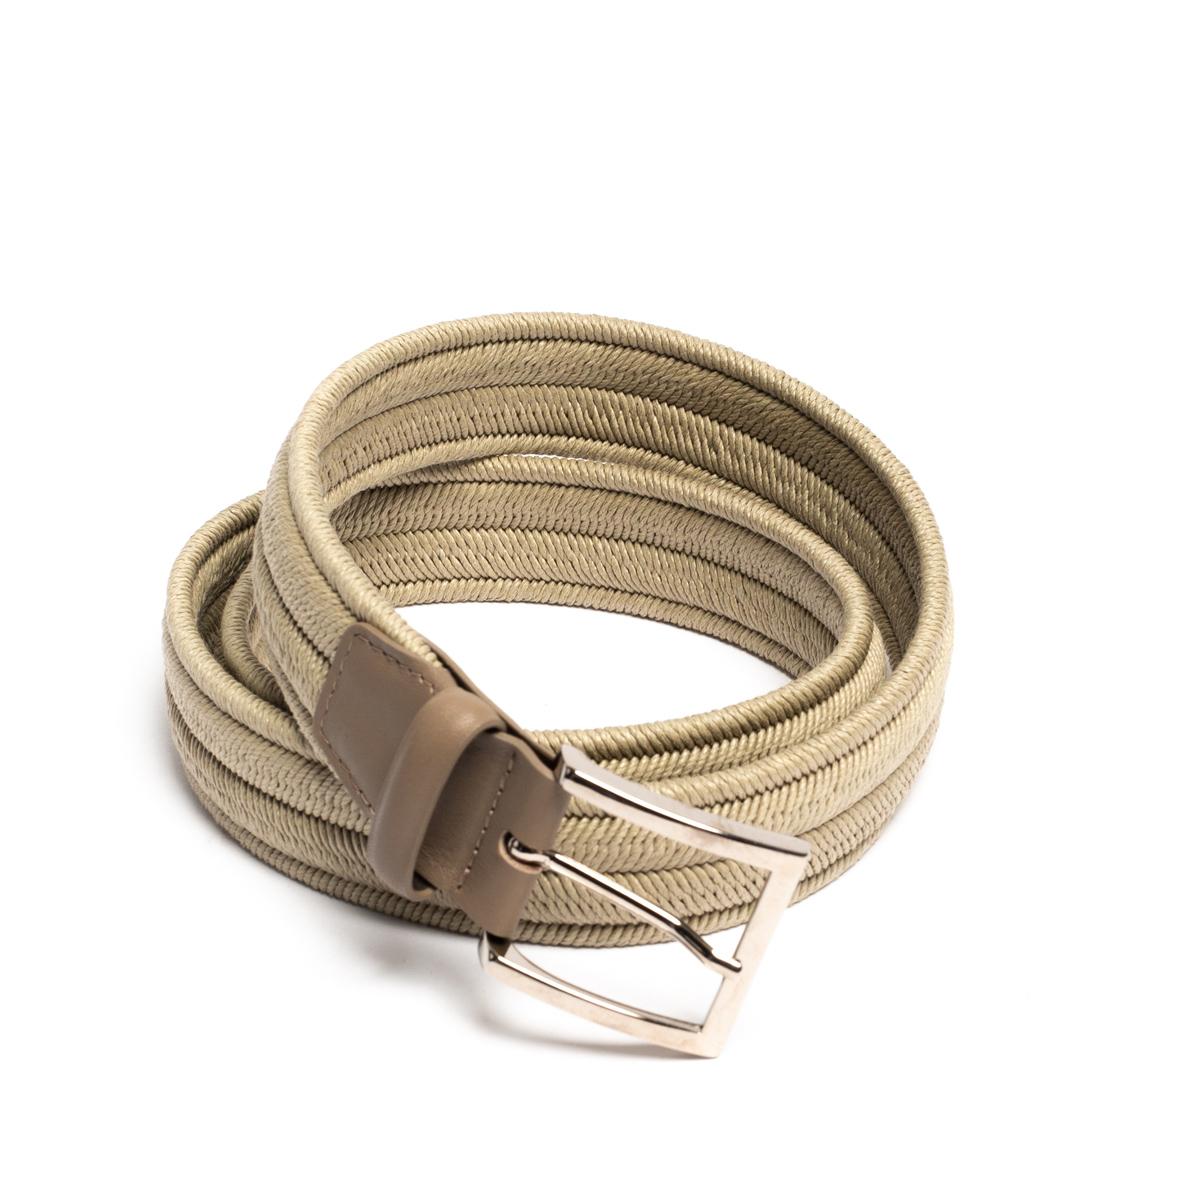 Cintura Orciani Elast Sabbia